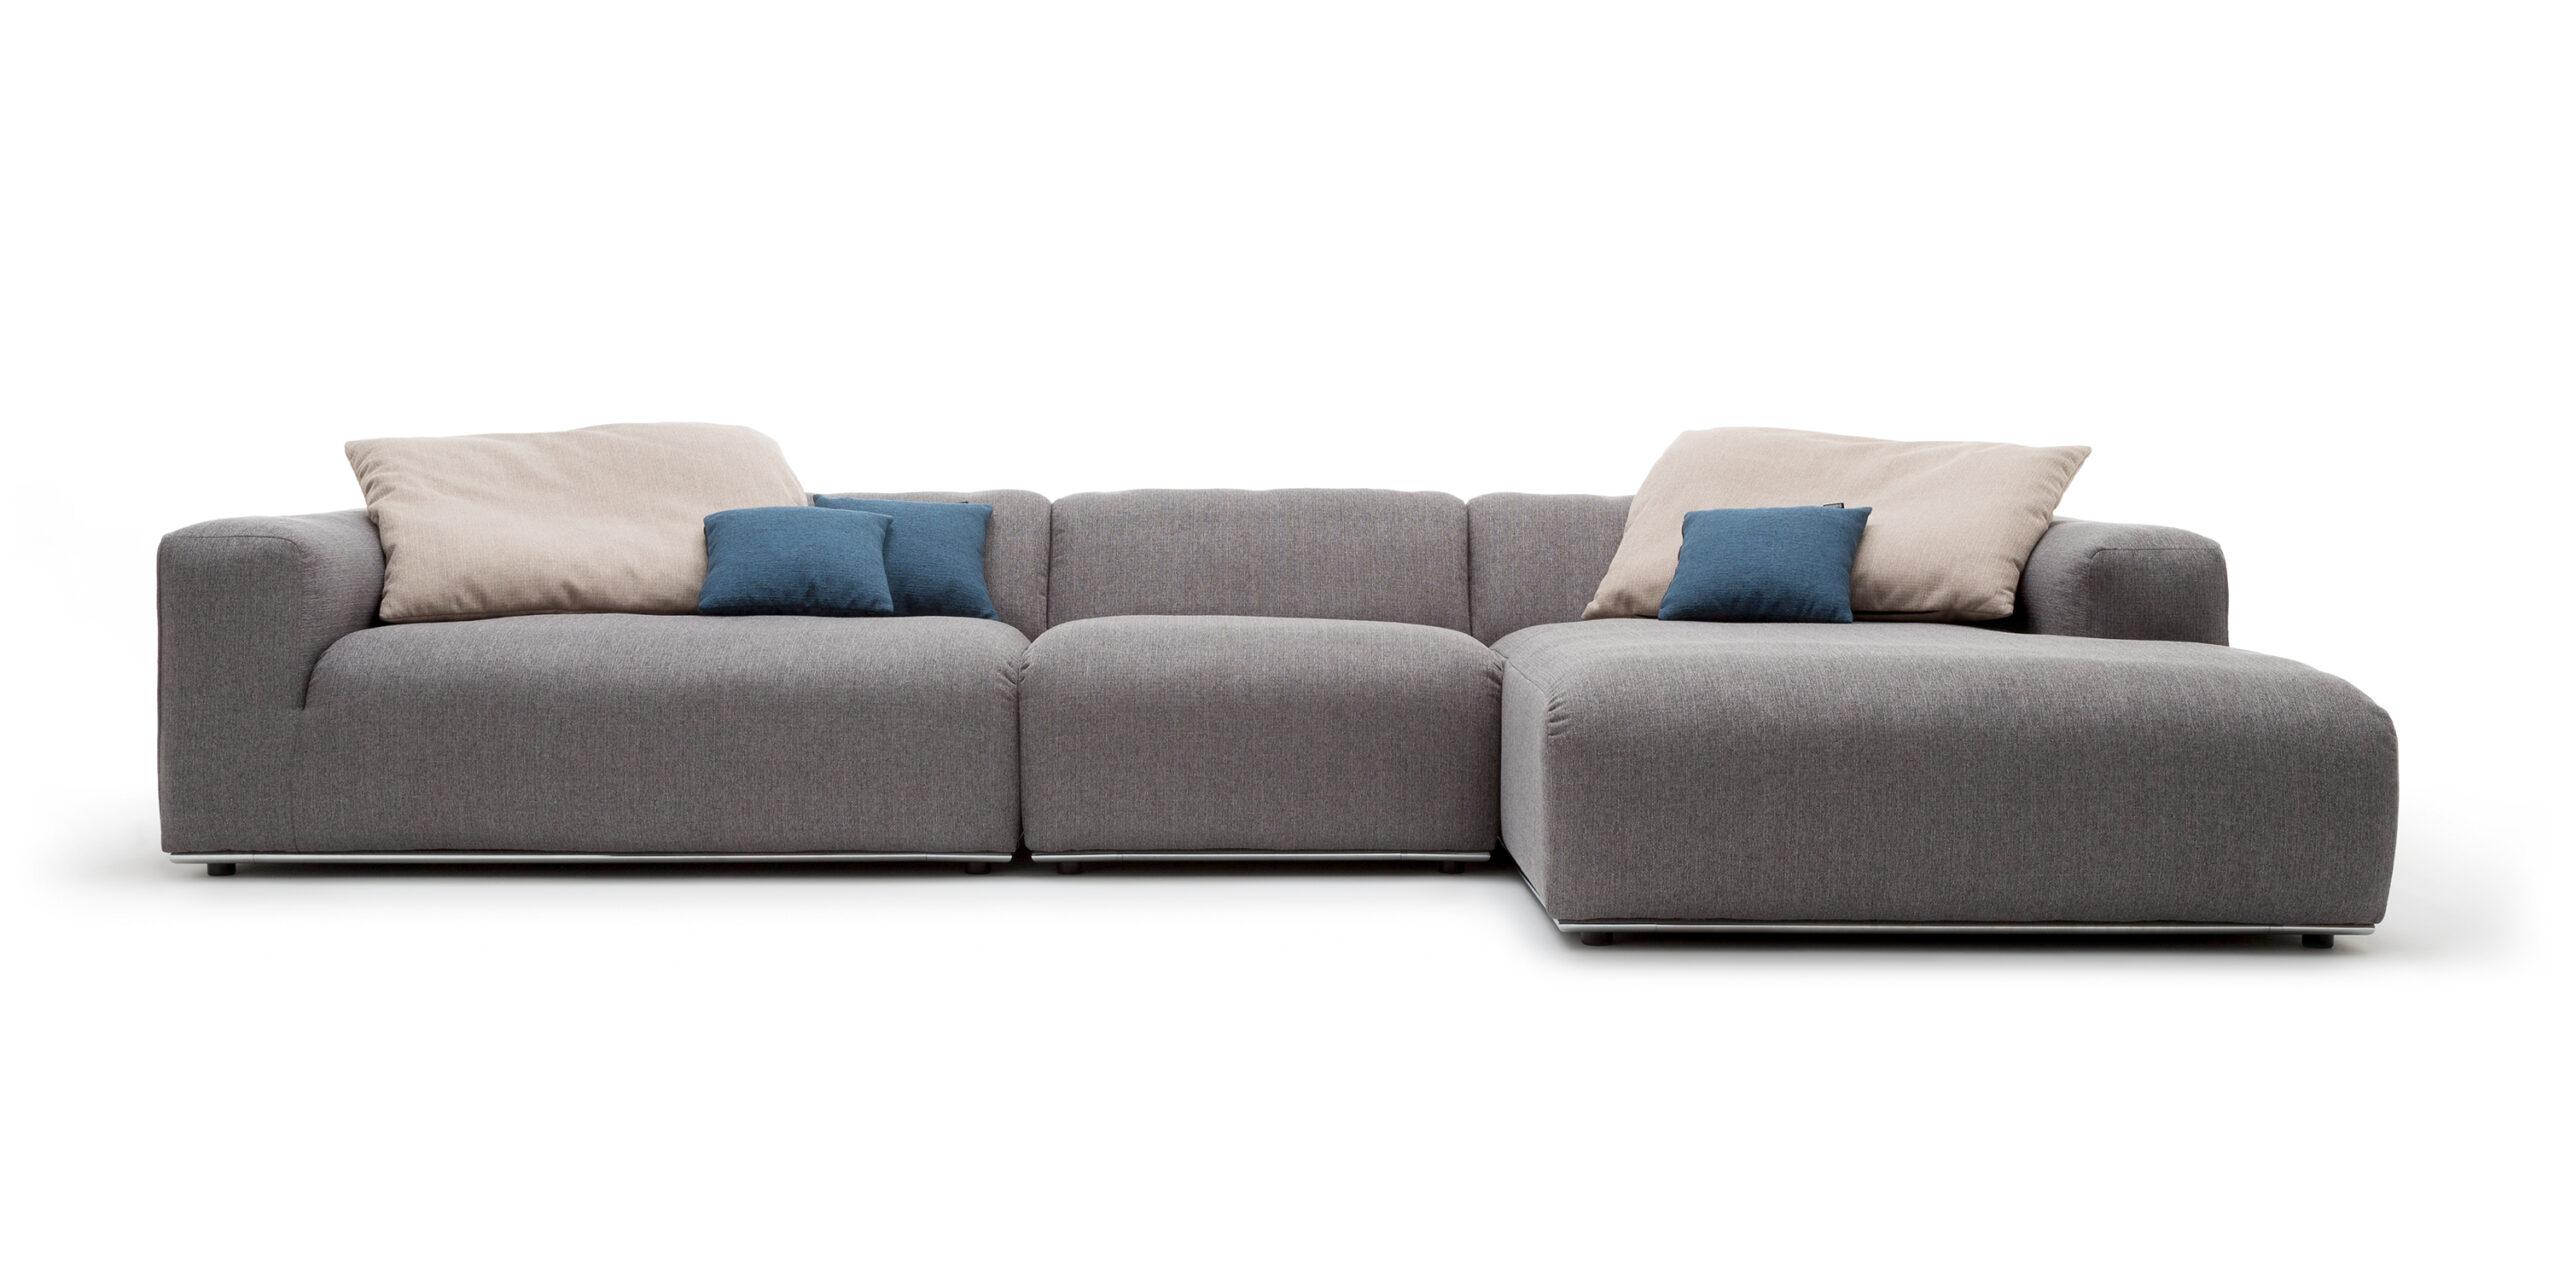 Full Size of Couch Freistil Rolf Benz Sofa Showroom Hamburg Sofa 180 164 Von 134 187 Dreieinhalbsitzer Sofa 165 By 133 141 Preis 175 Sessel 185 Graues Verkaufen Breit Sofa Freistil Sofa